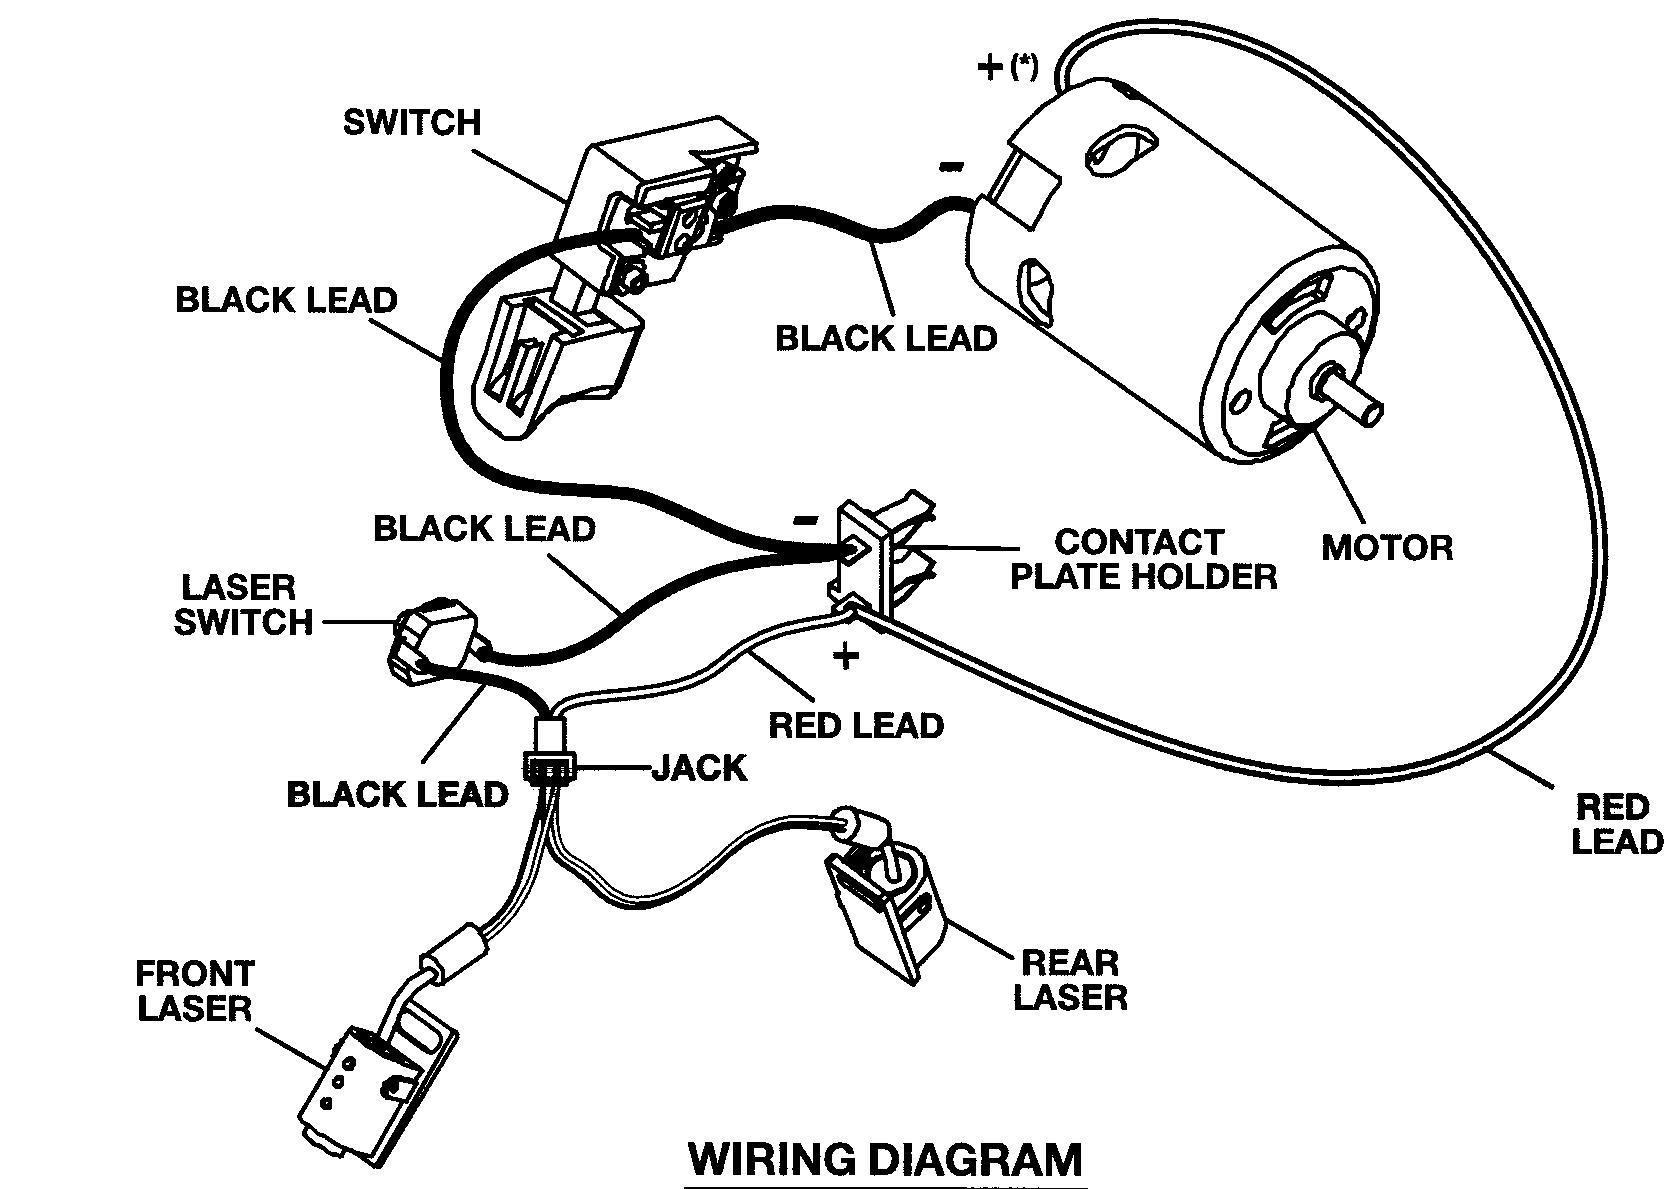 hight resolution of craftsman 315115850 wiring diagram diagram